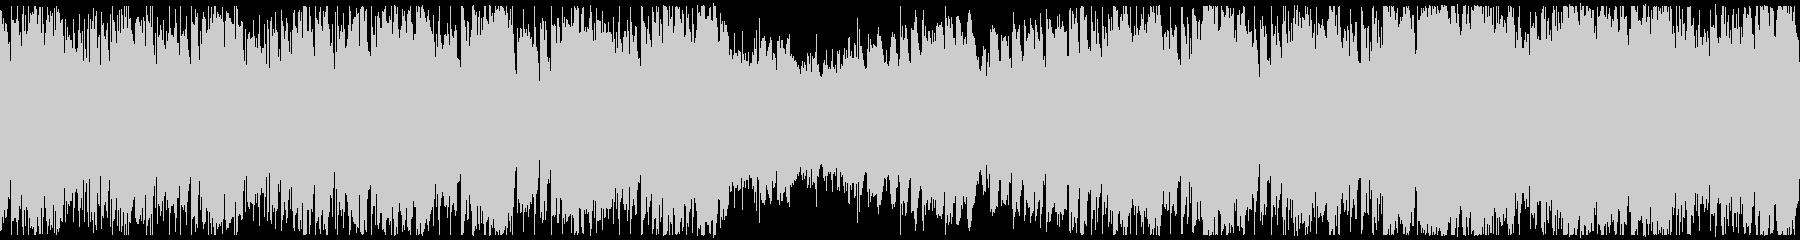 Youtube / Gentle Western pop's unreproduced waveform